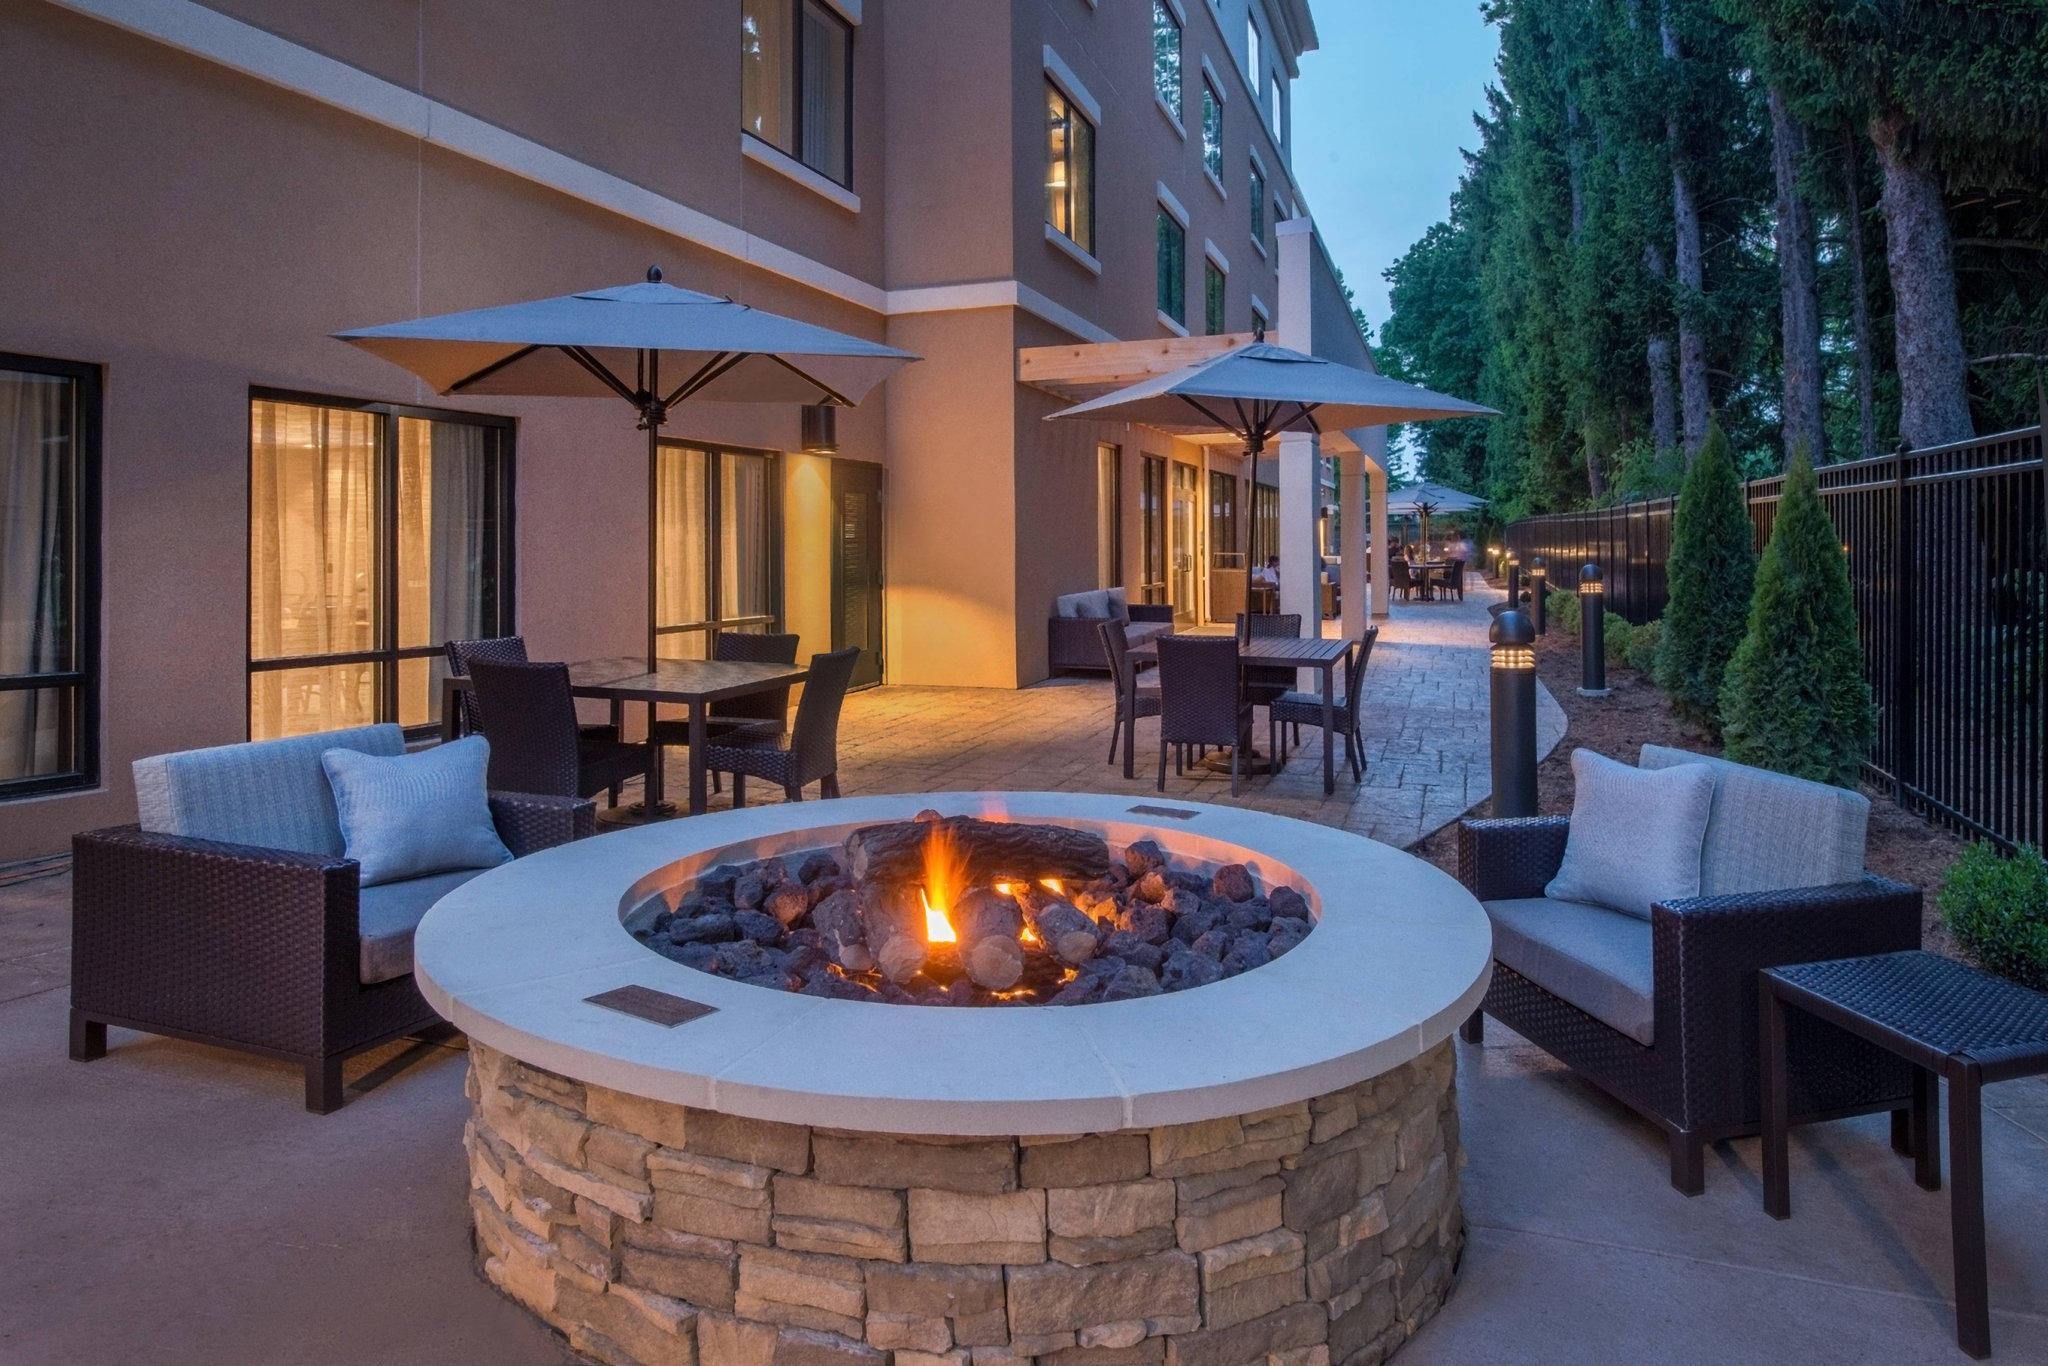 Courtyard by Marriott Hershey Chocolate Avenue